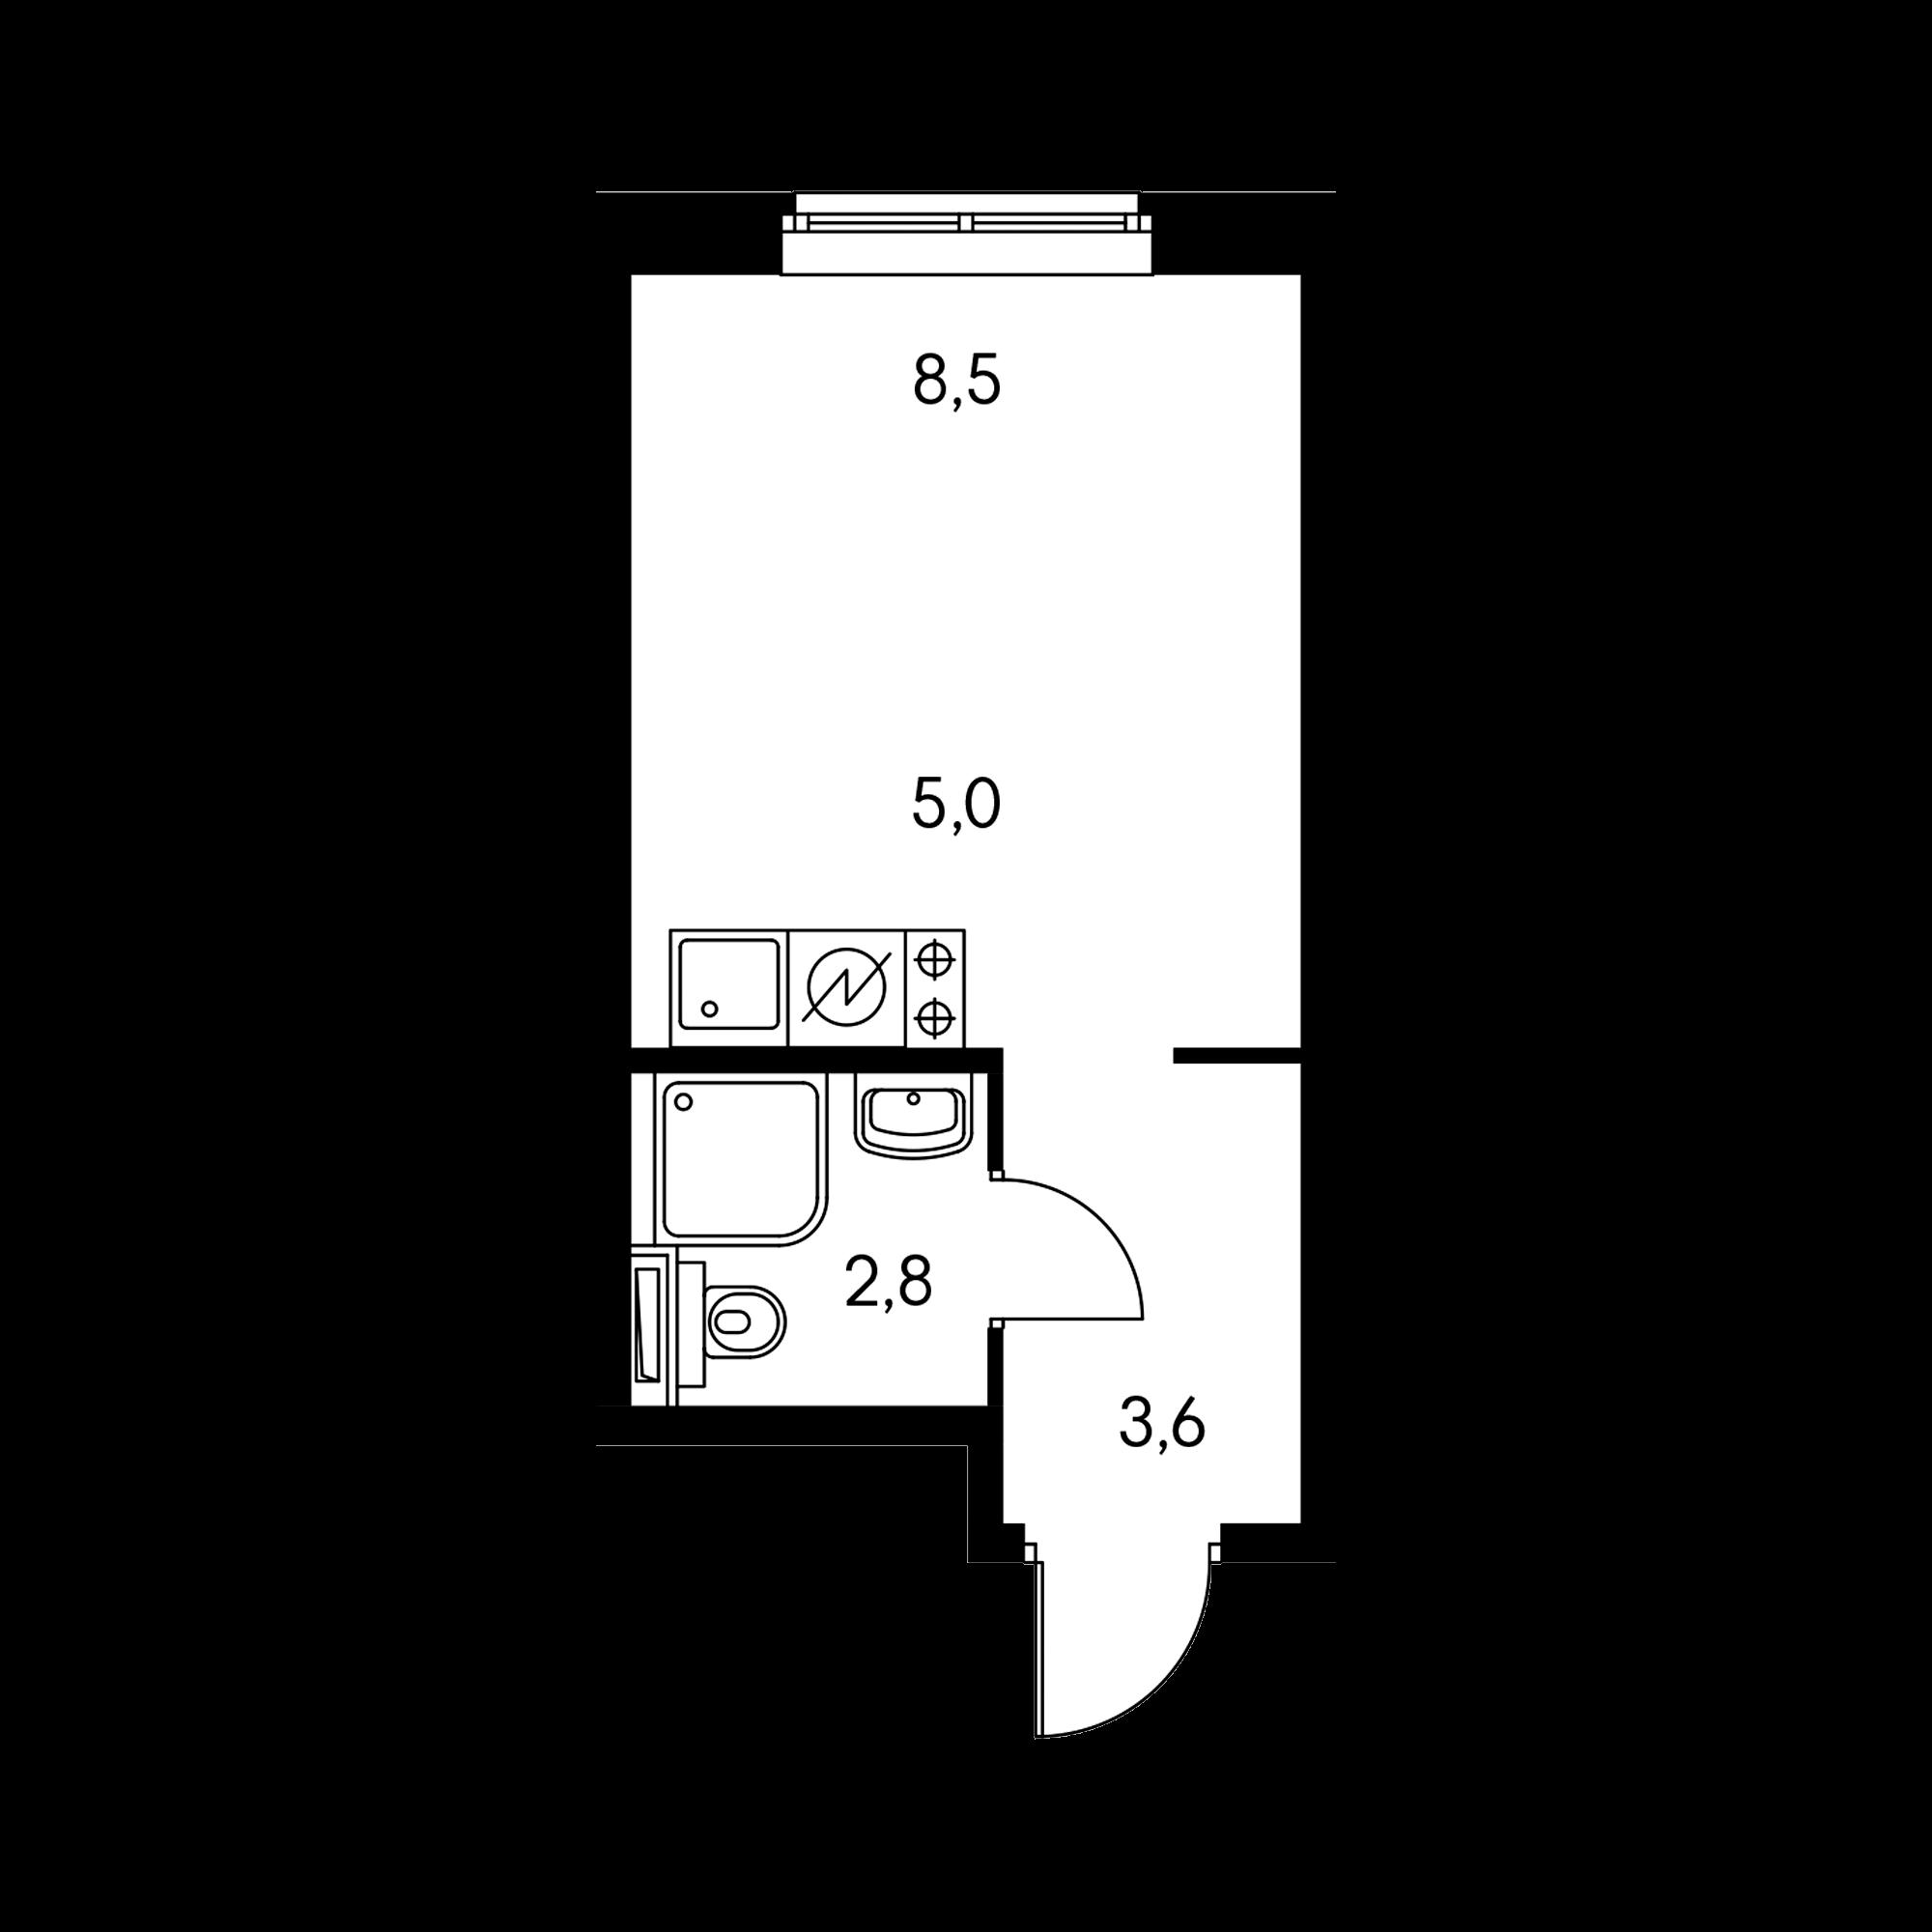 1NS1_3.6-1